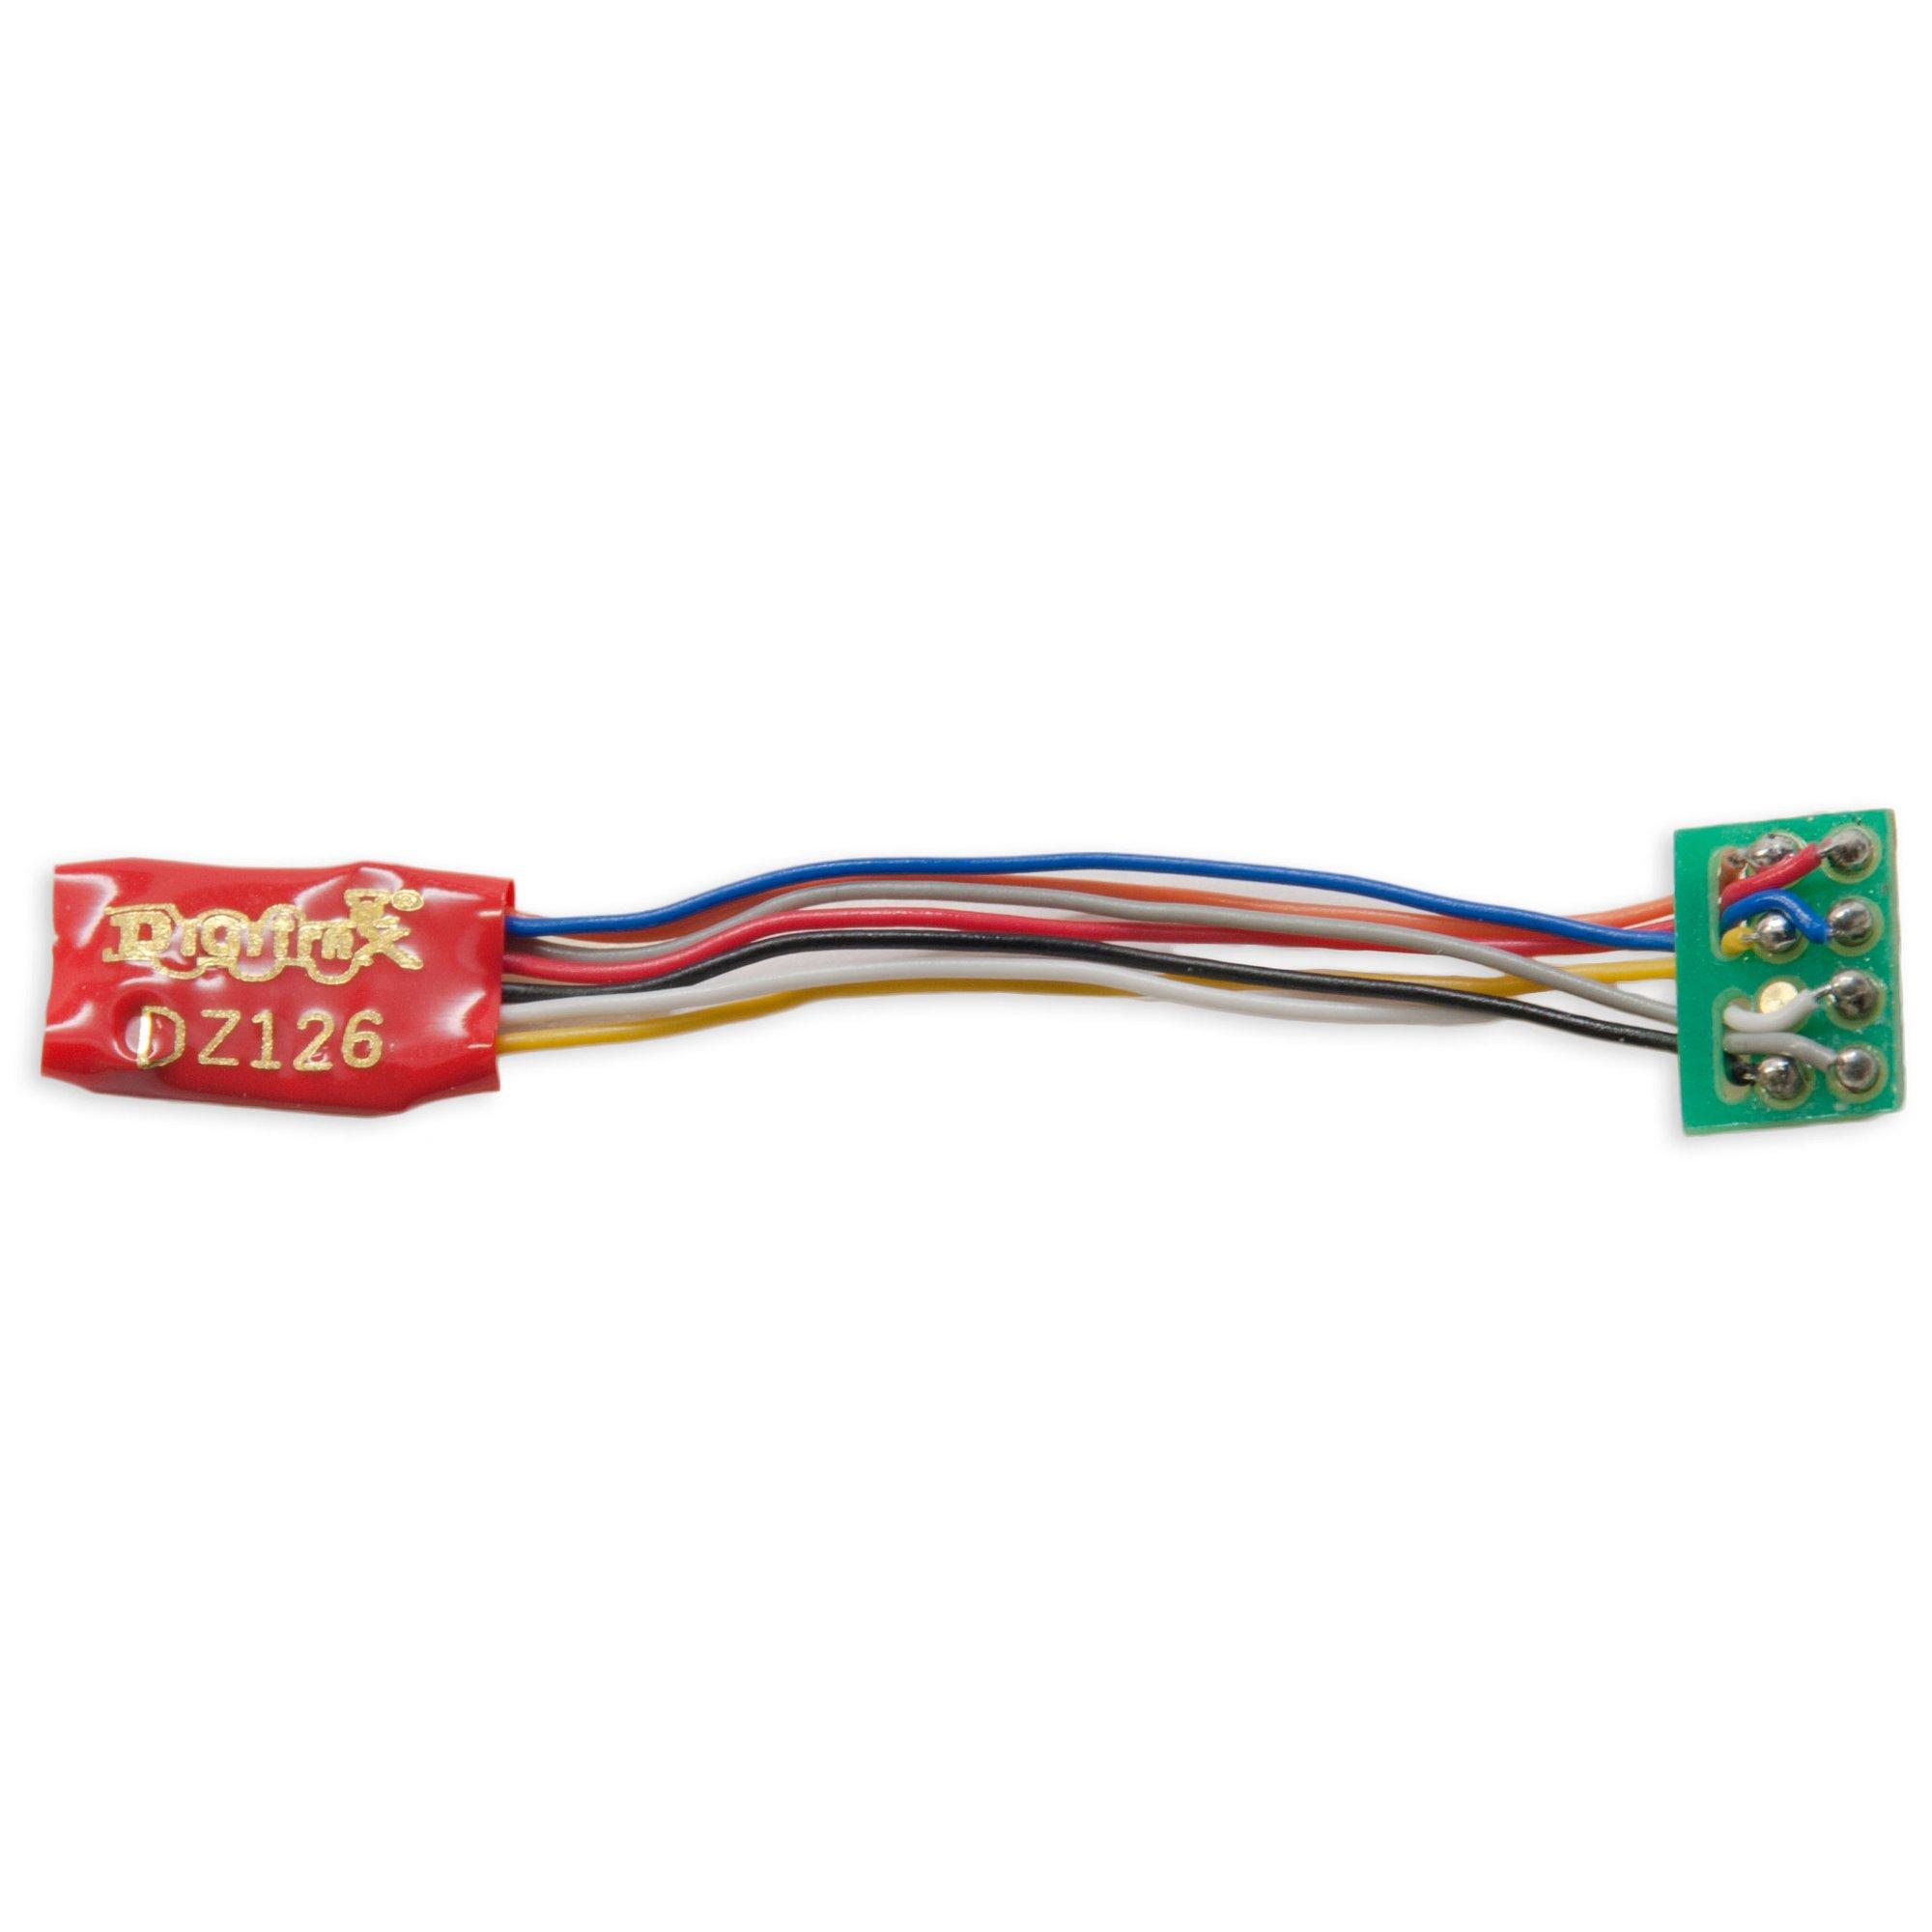 N DIGITRAX DZ126IN 1 Amp Z HO Scale Decoder with 6 Pin NEM 651 type plug N